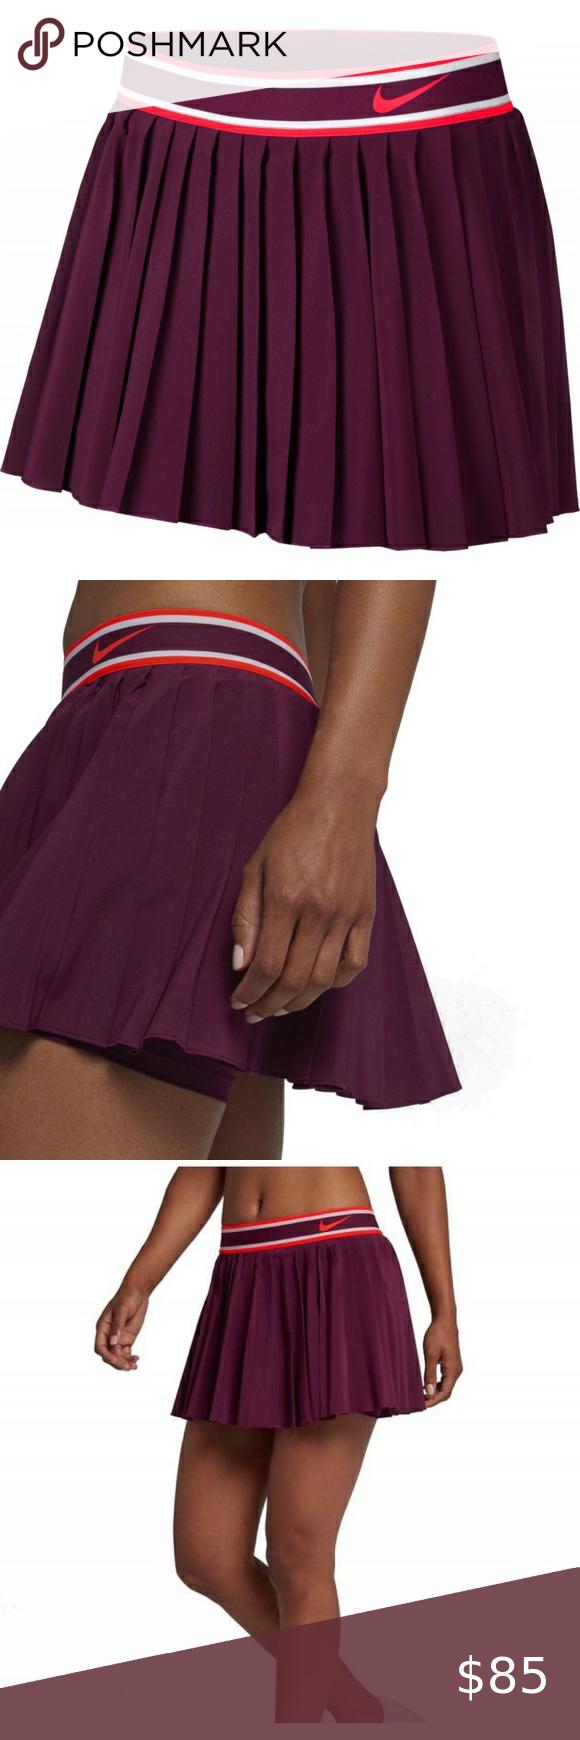 Nwt Nike Victory Court Pleated Tennis Skirt Lg Nwt Nike Victory Court Pleated Tennis Skirt Size Large New With T In 2020 Pleated Tennis Skirt Tennis Skirt Nike Skirts